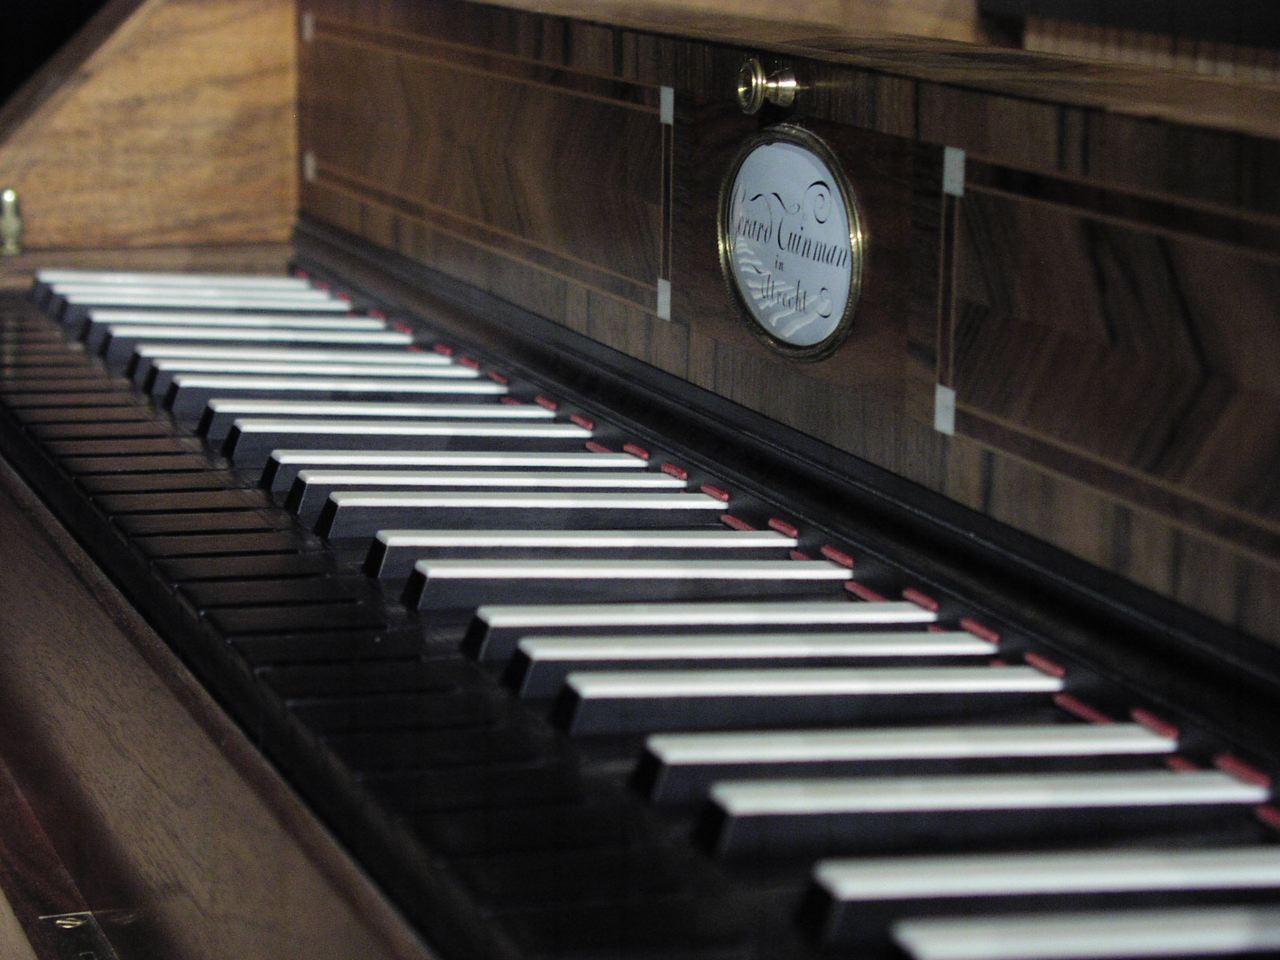 Tuinman fortepiano